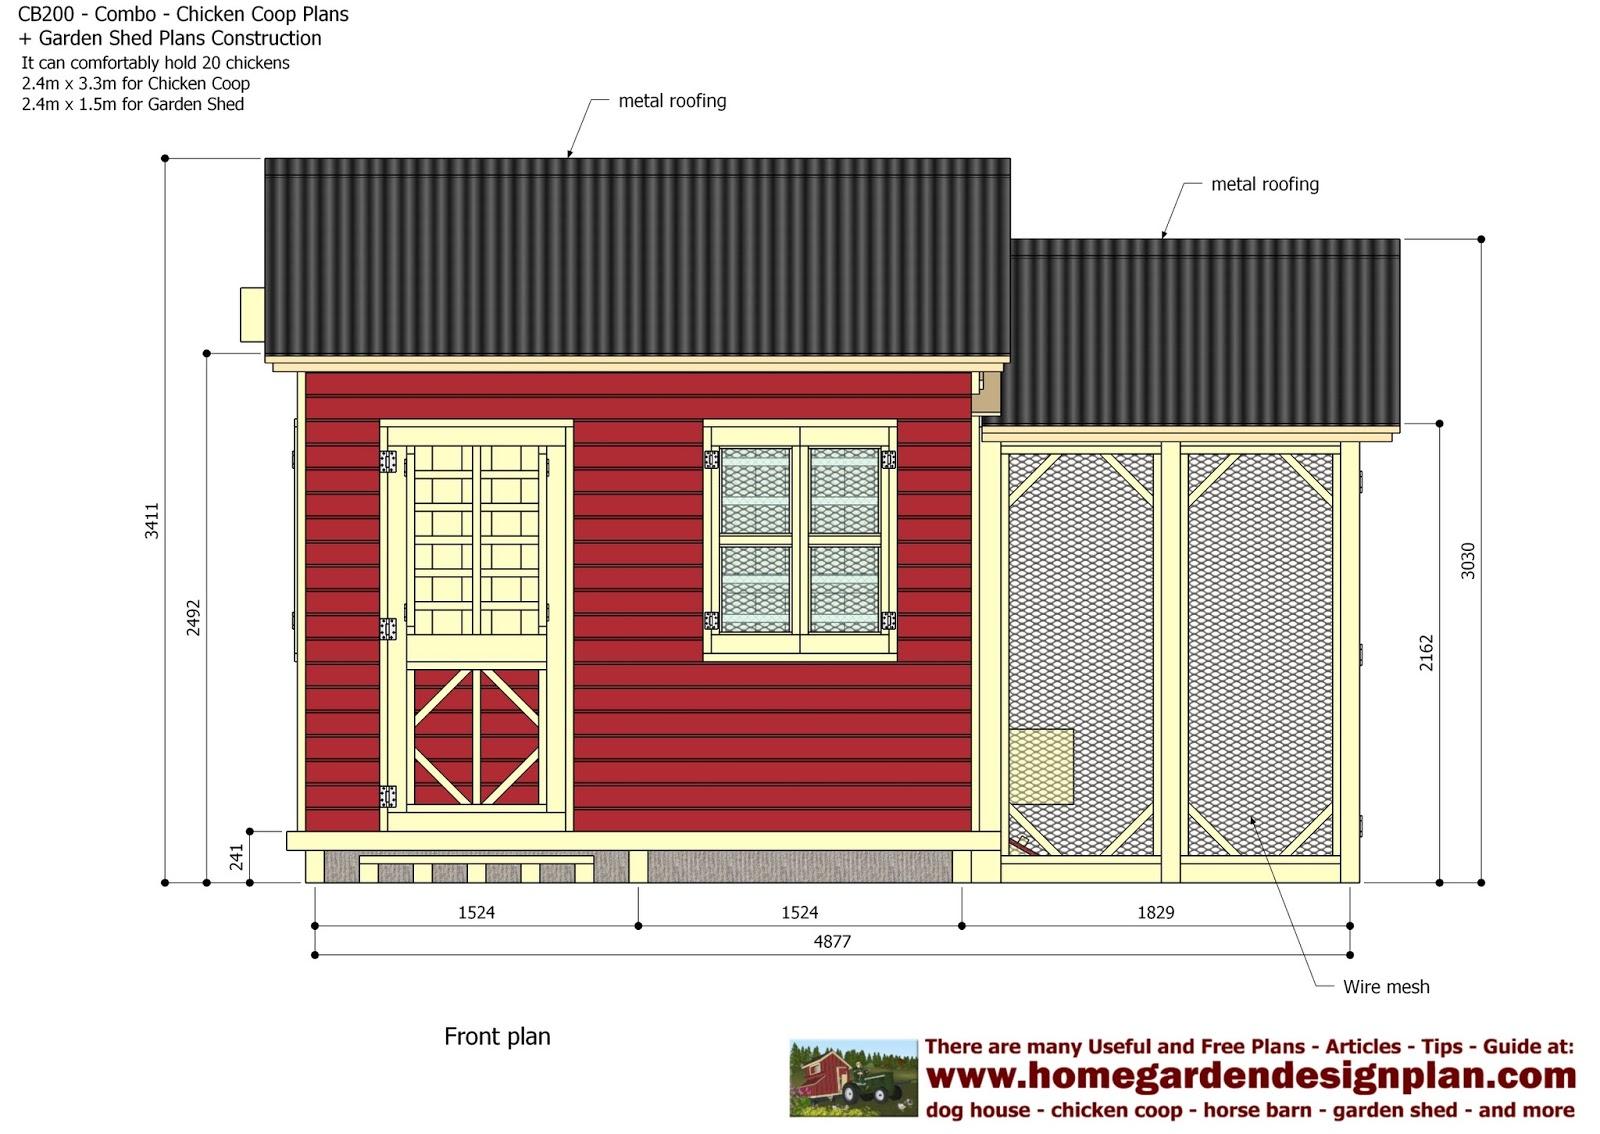 Garden Sheds 3m X 4m home garden plans: cb200 - combo plans - chicken coop plans